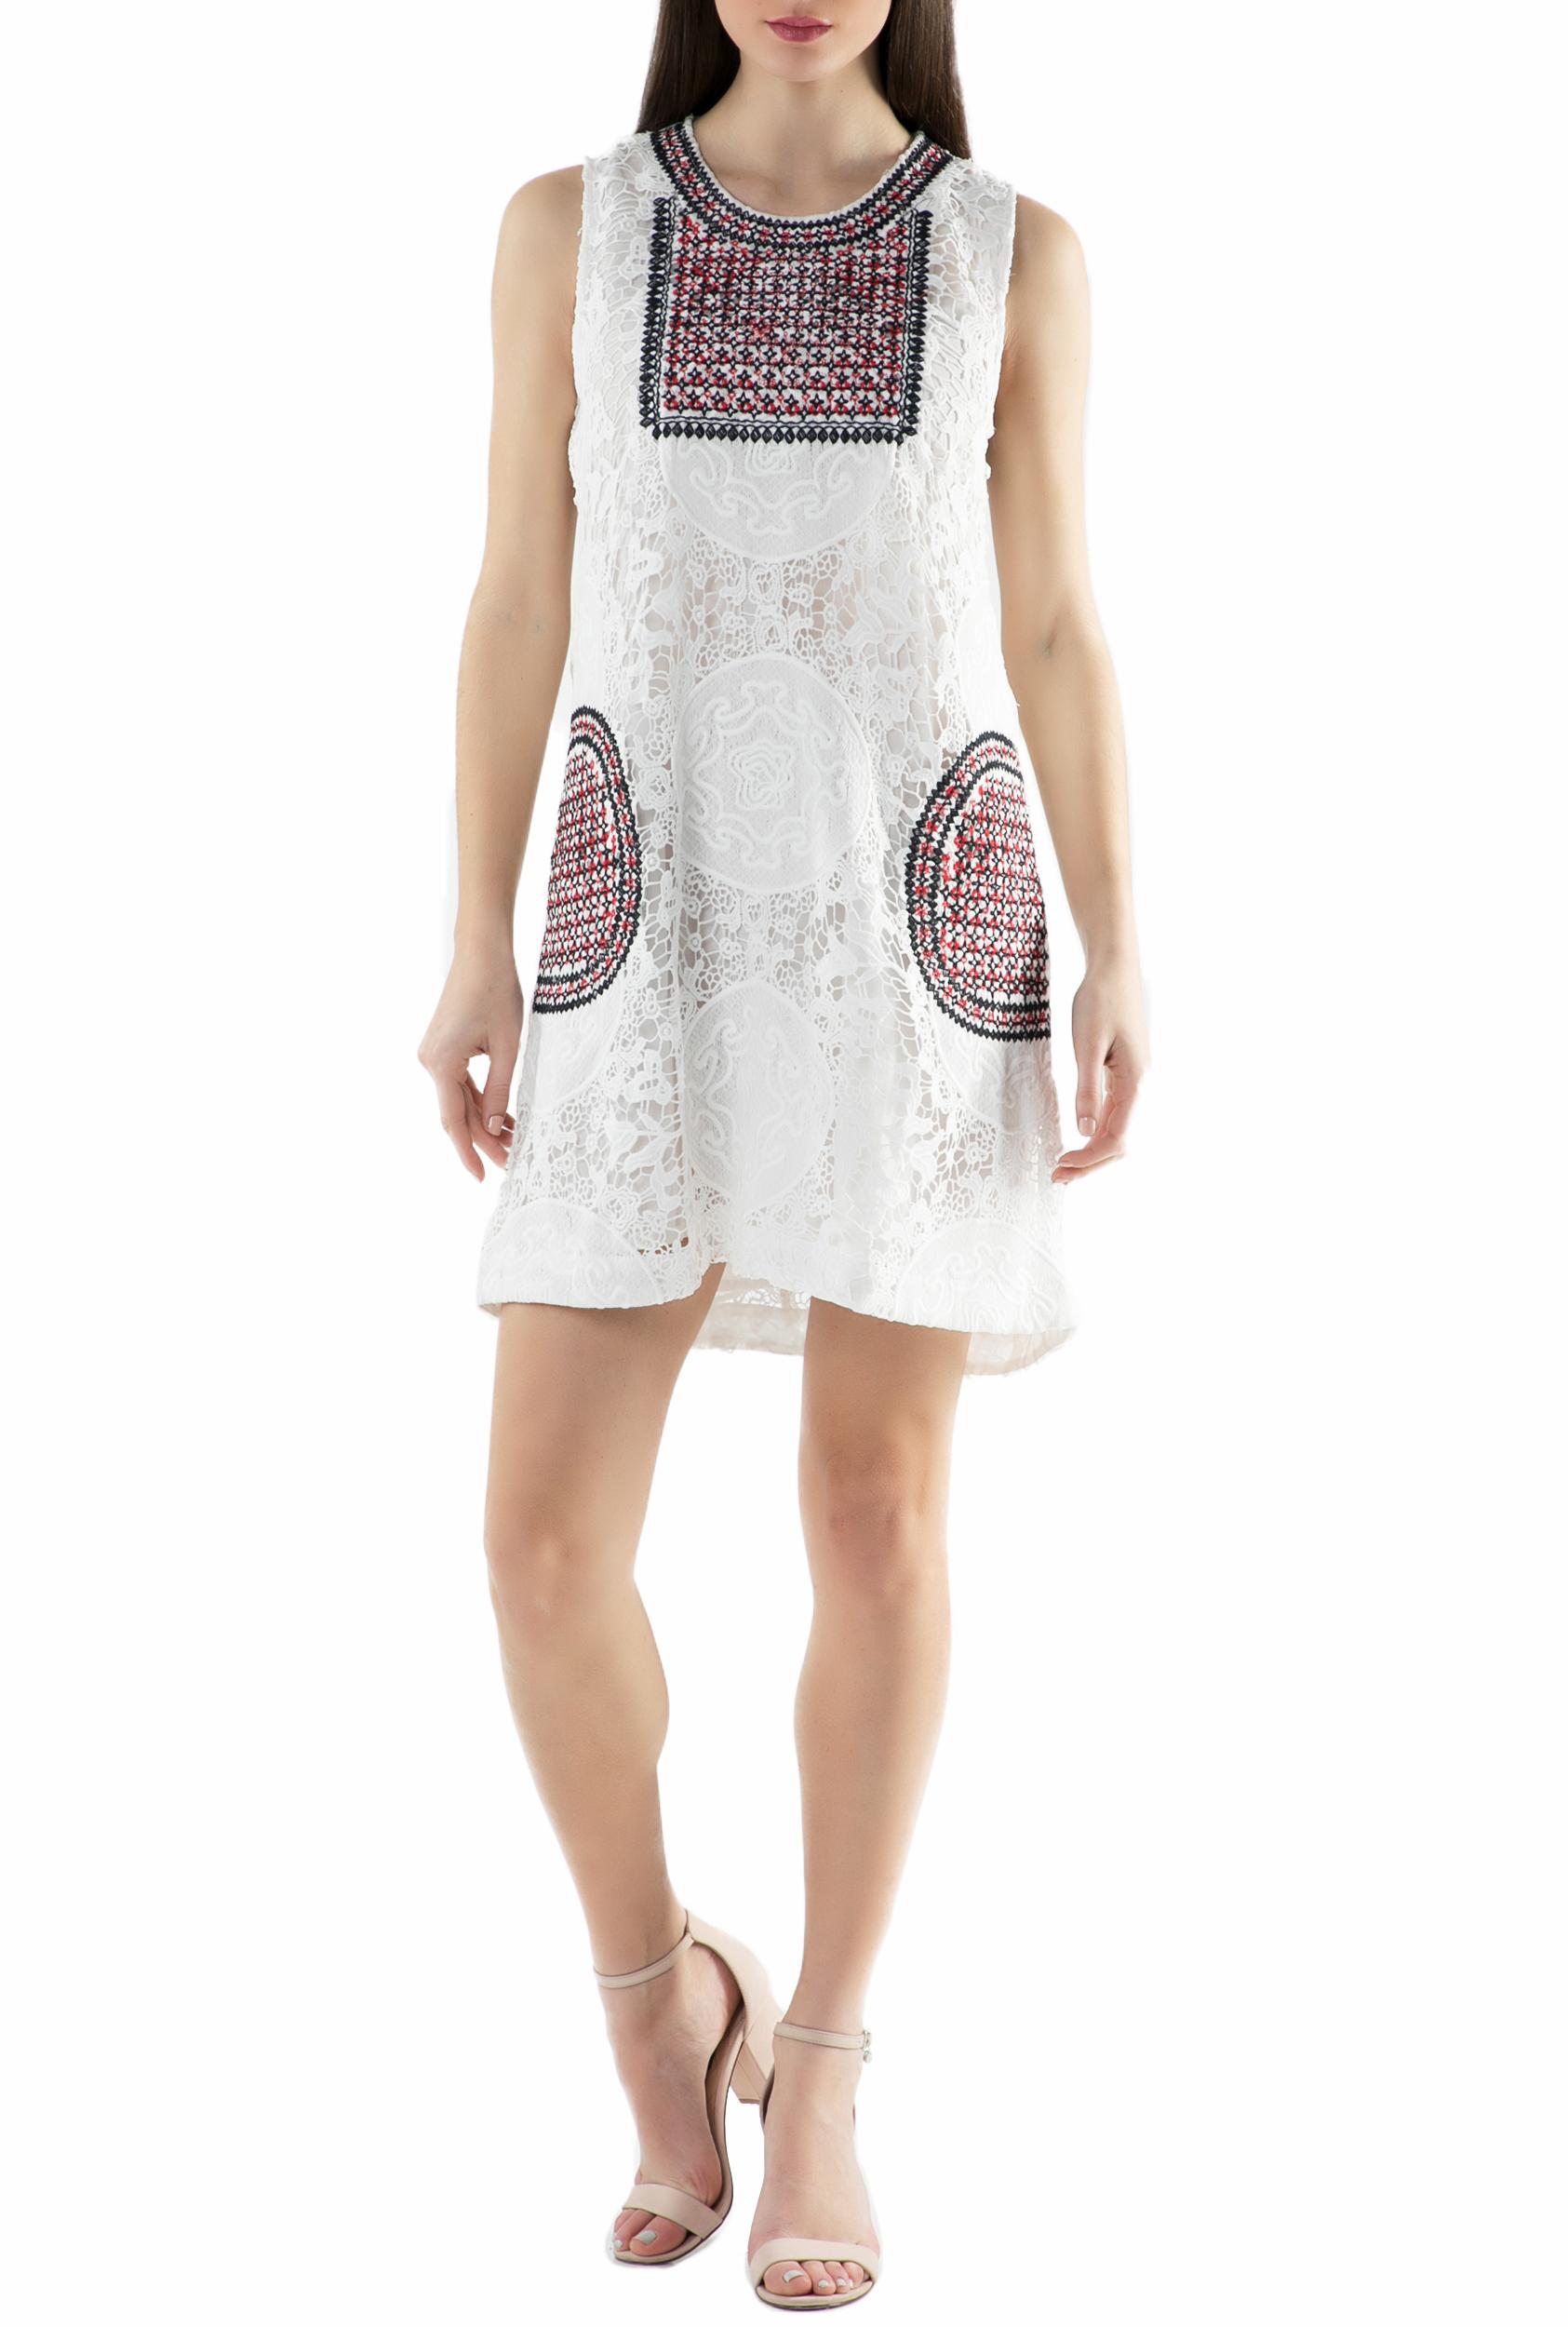 MOLLY BRACKEN - Γυναικείο μίνι φόρεμα Molly Bracken λευκό με δαντέλα γυναικεία ρούχα φόρεματα μίνι